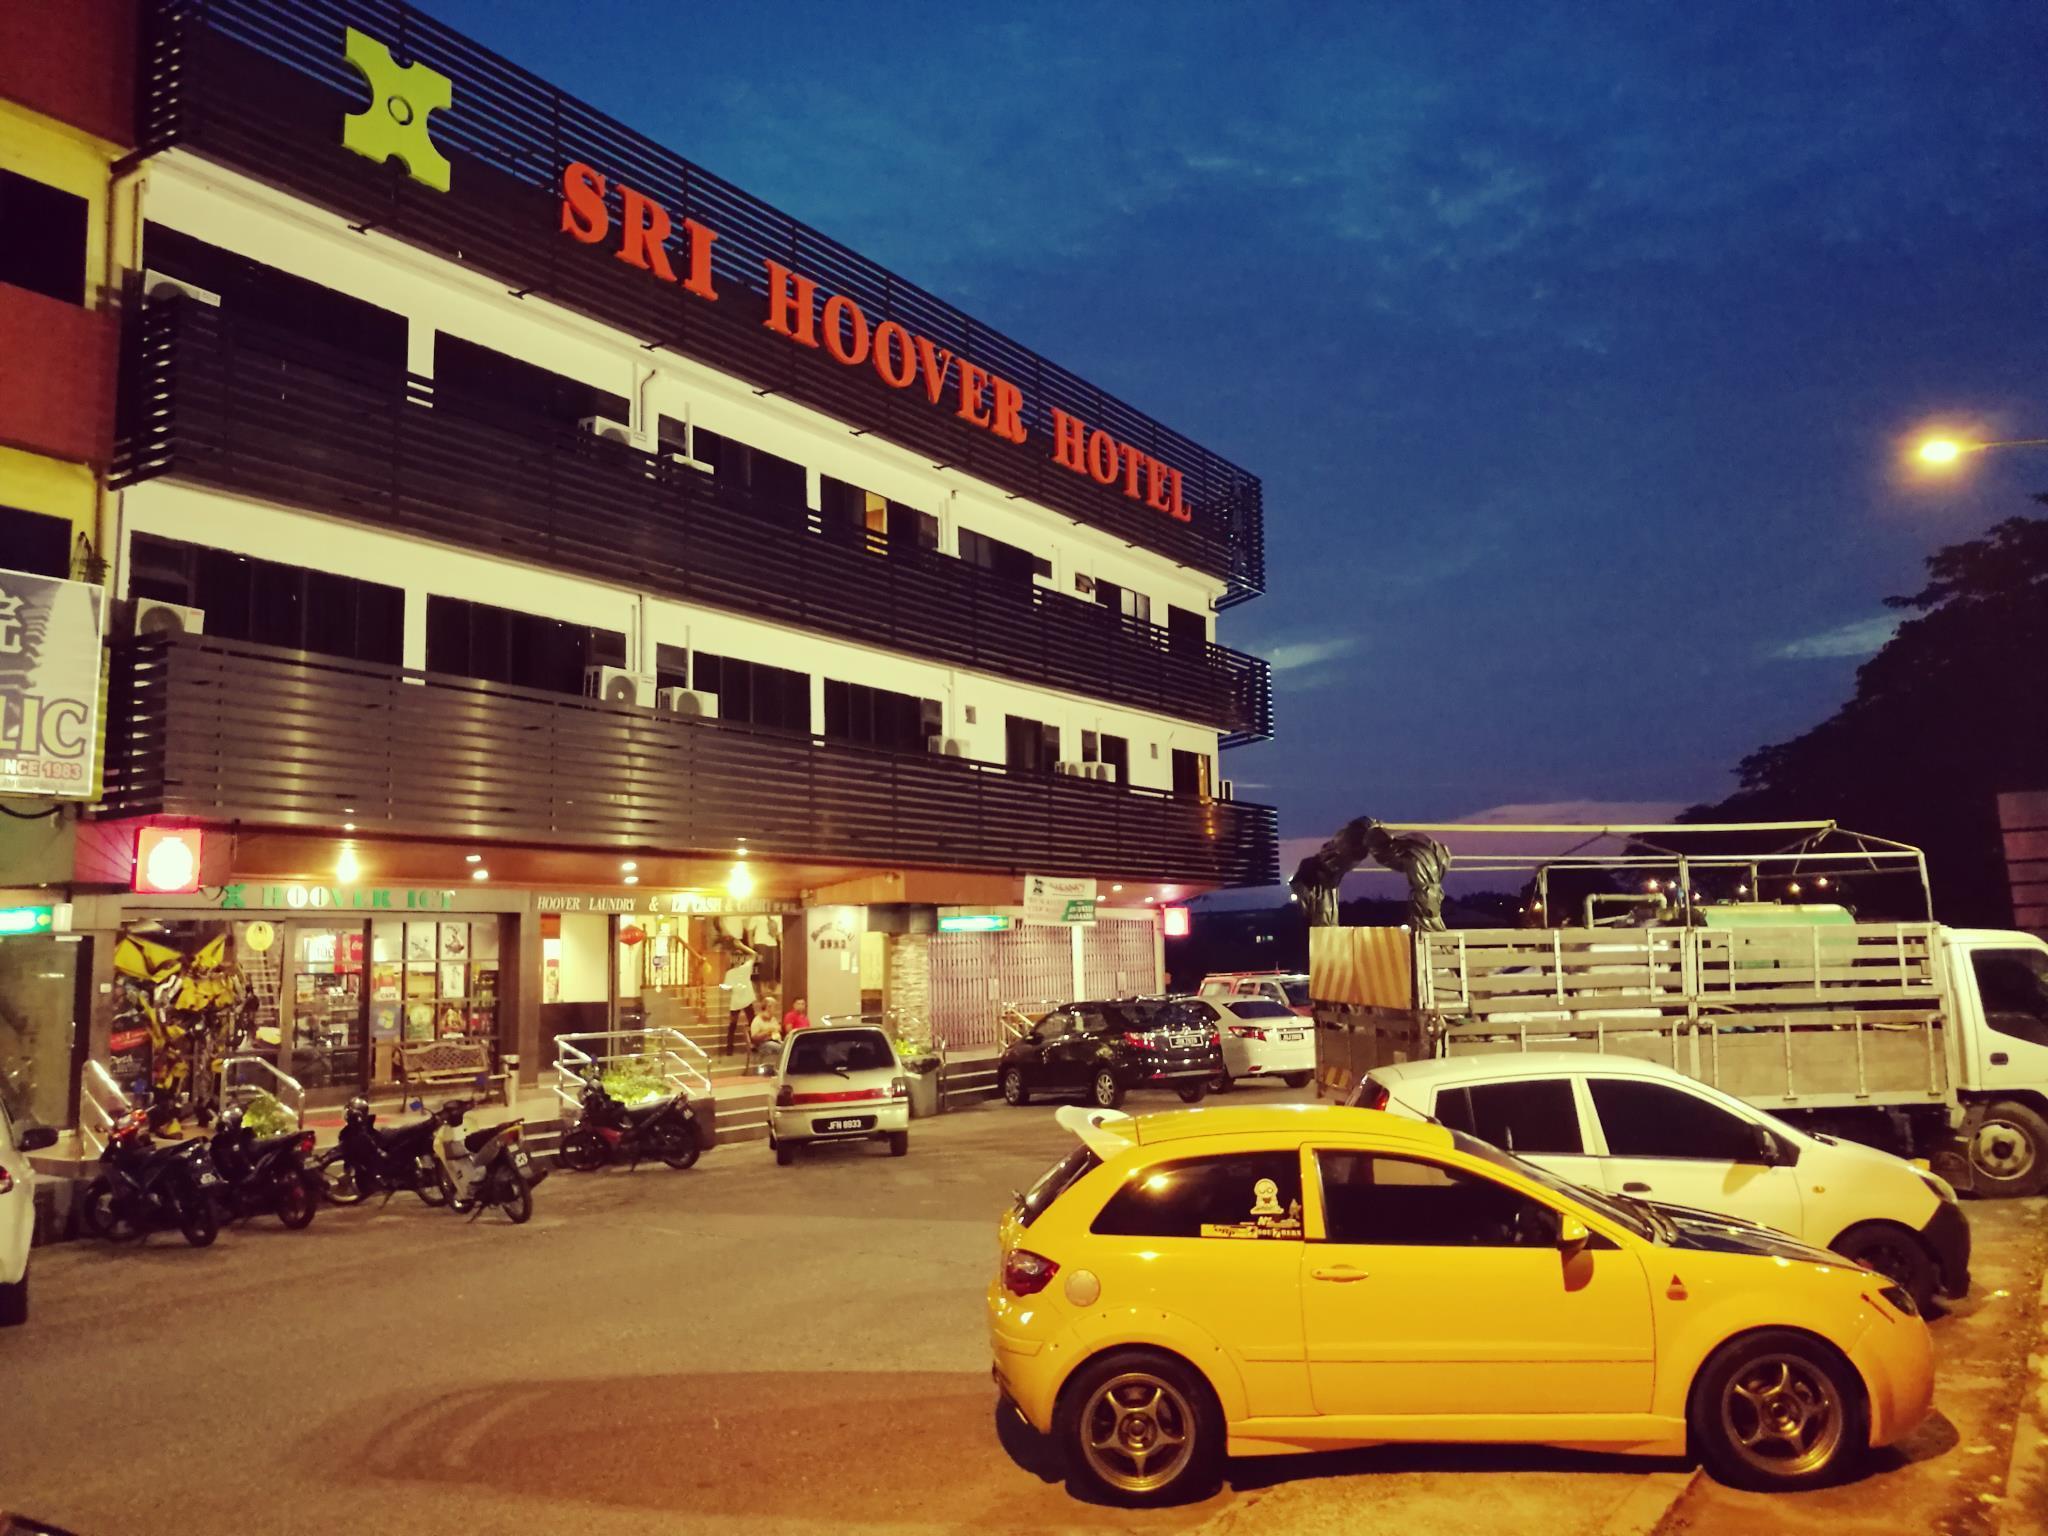 Sri Hoover Hotel